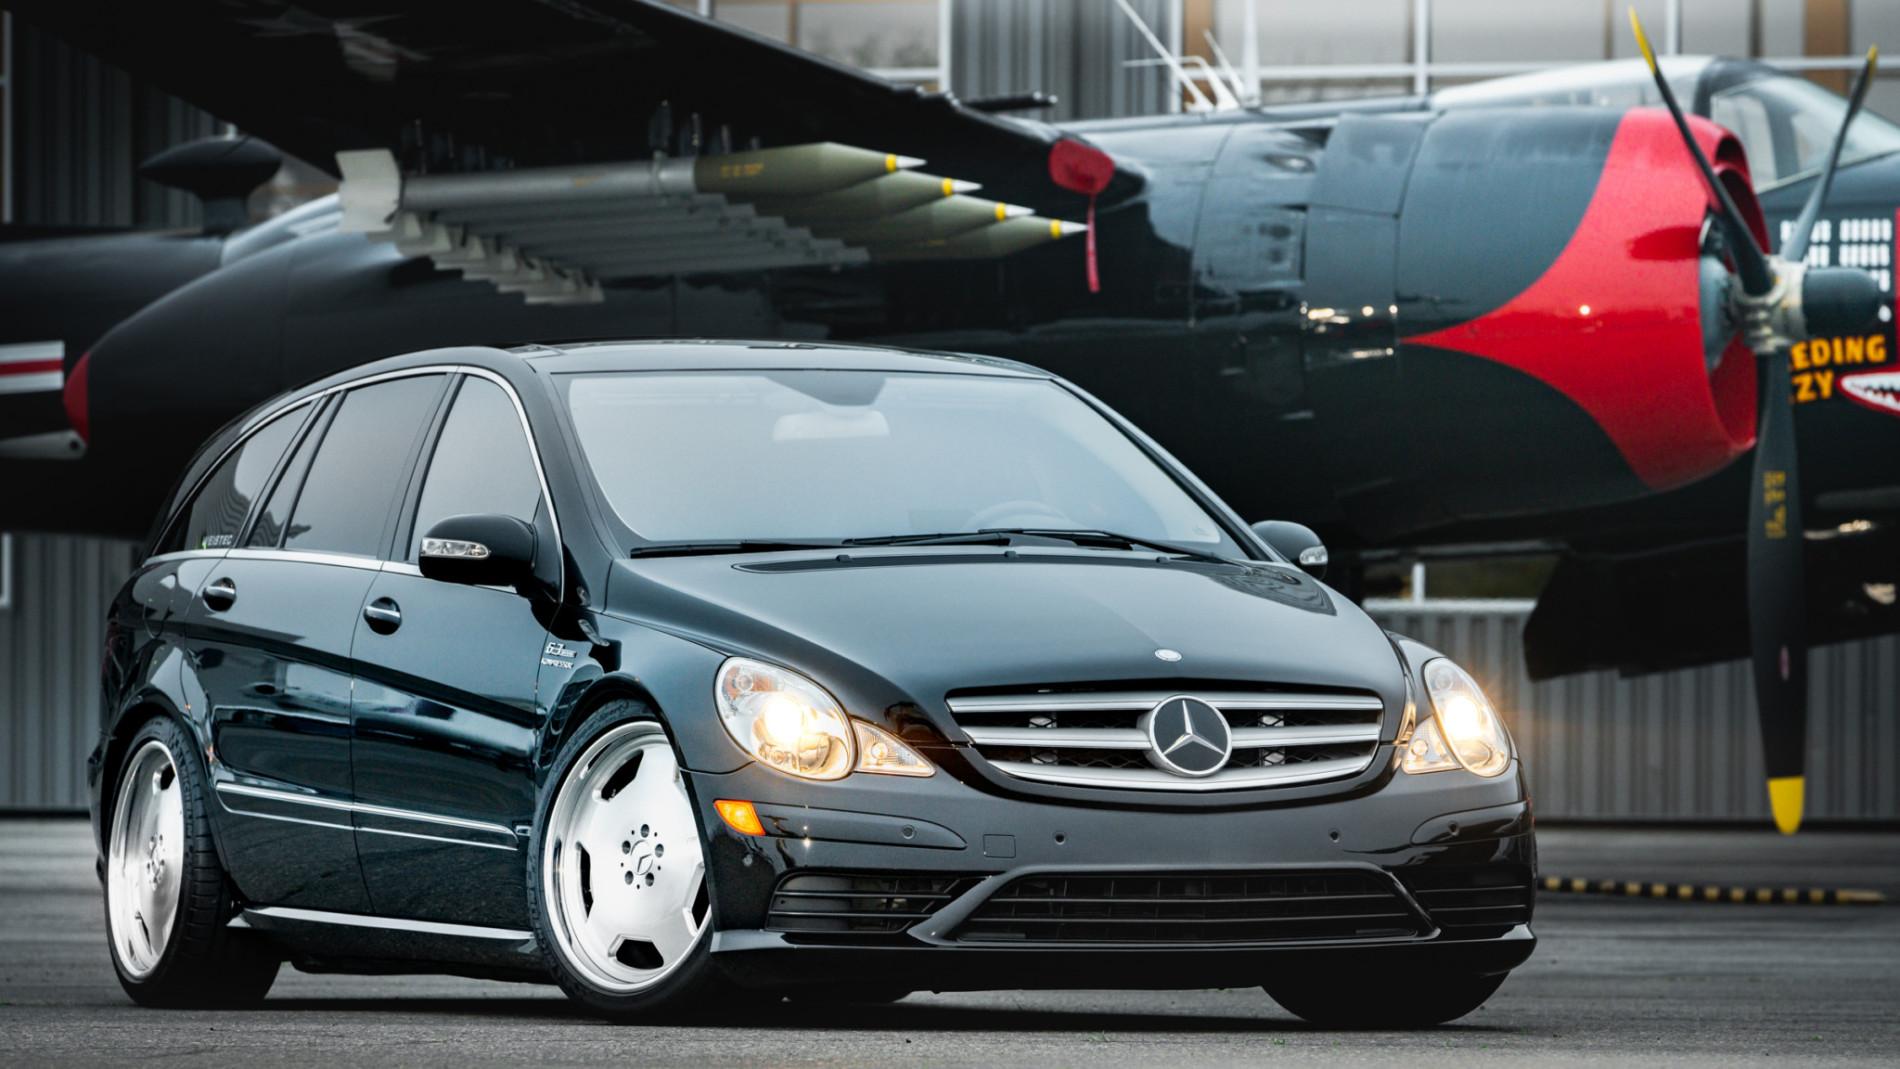 Mercedes R63 AMG de 700 CP - Mercedes R63 AMG de 700 CP